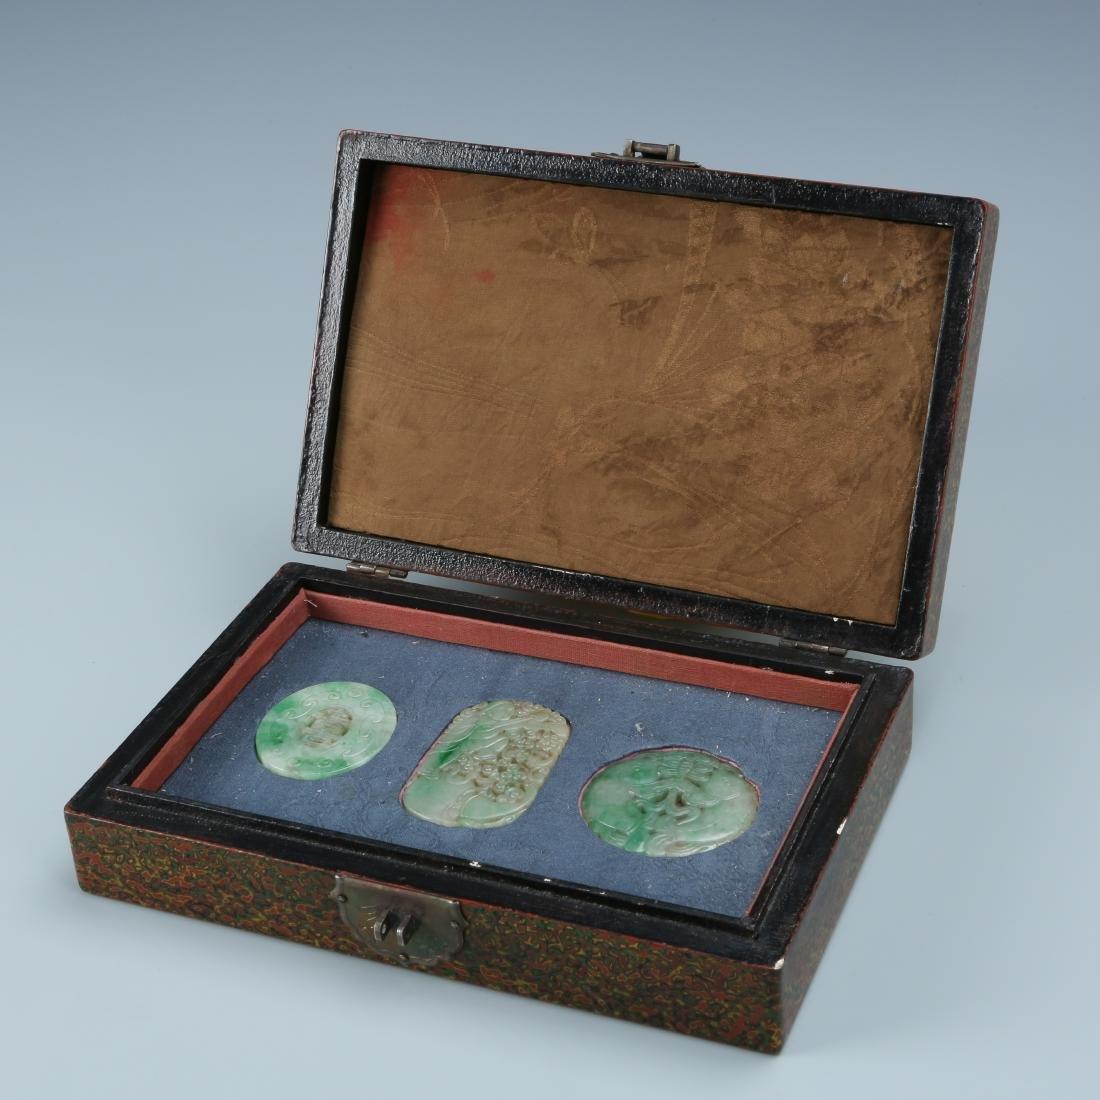 Three Jadeite Pendant in Display Box